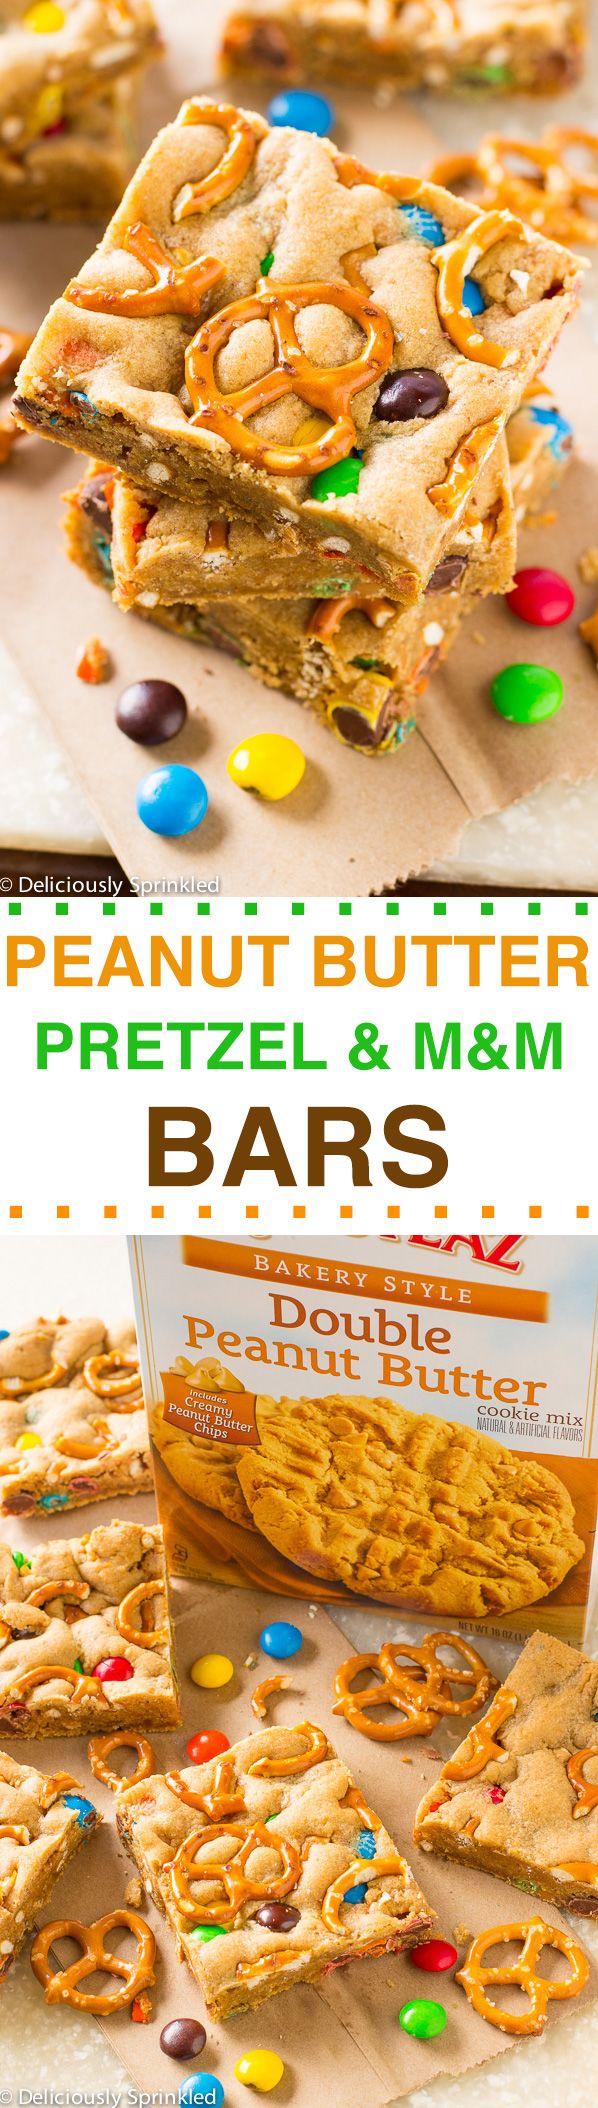 Peanut Butter Pretzel & M&M Bars